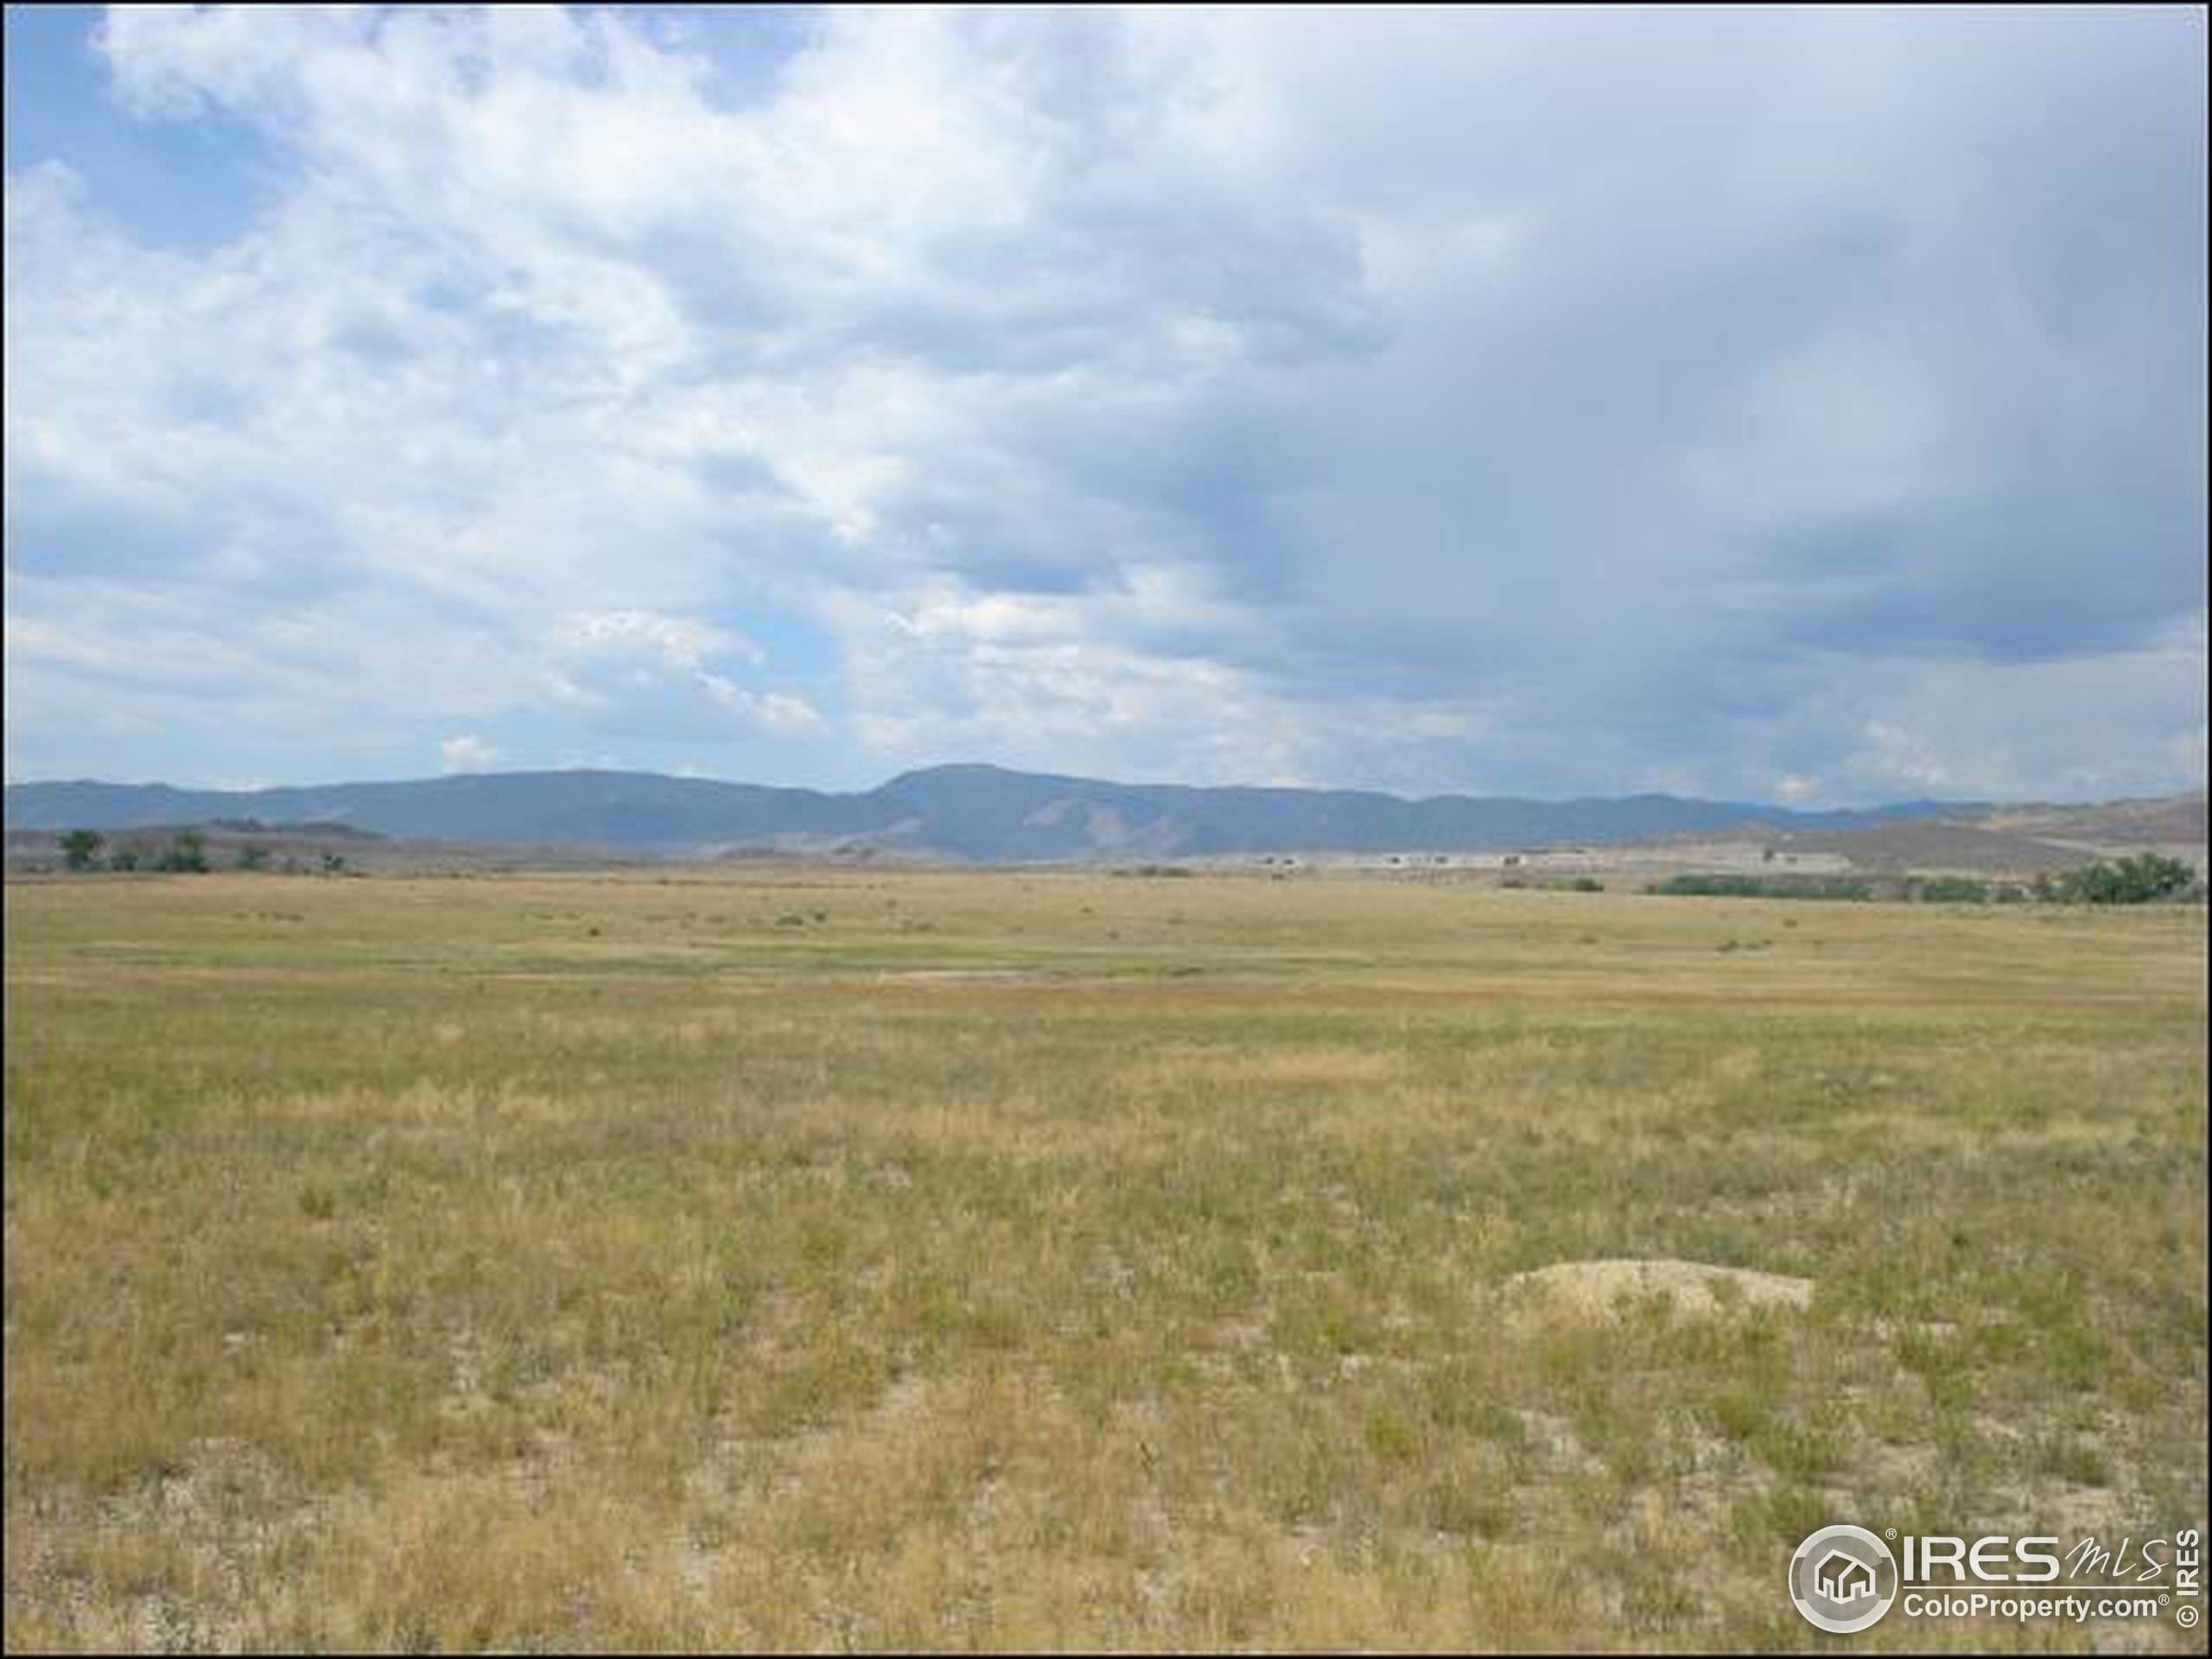 5014 Fox Hill Dr, Longmont, CO 80504 (MLS #877240) :: 8z Real Estate